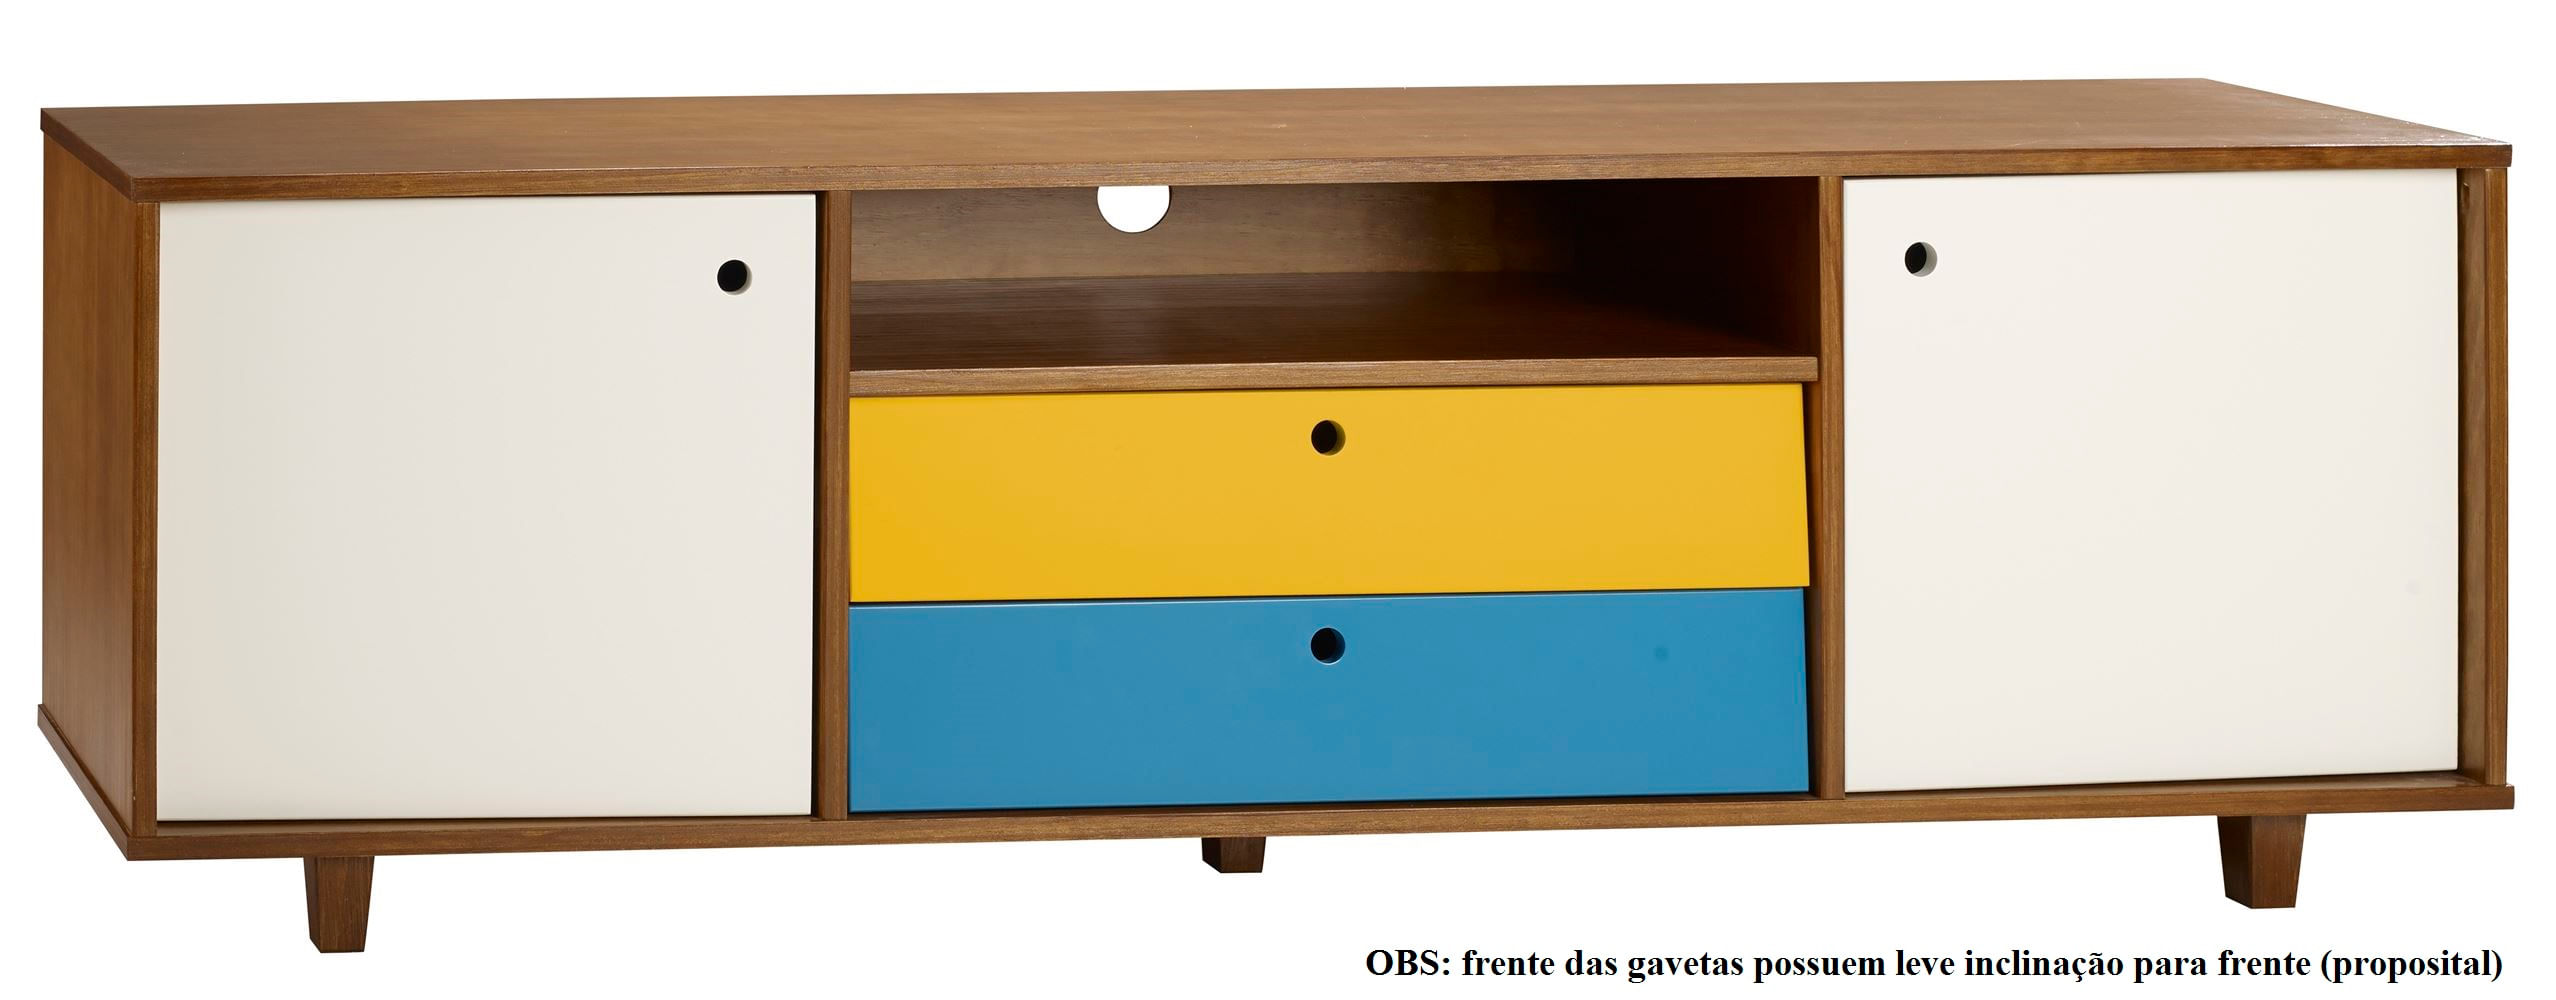 Rack Vintage Com 2 Gavetas Amendoa/Branco/Azul  - 30156